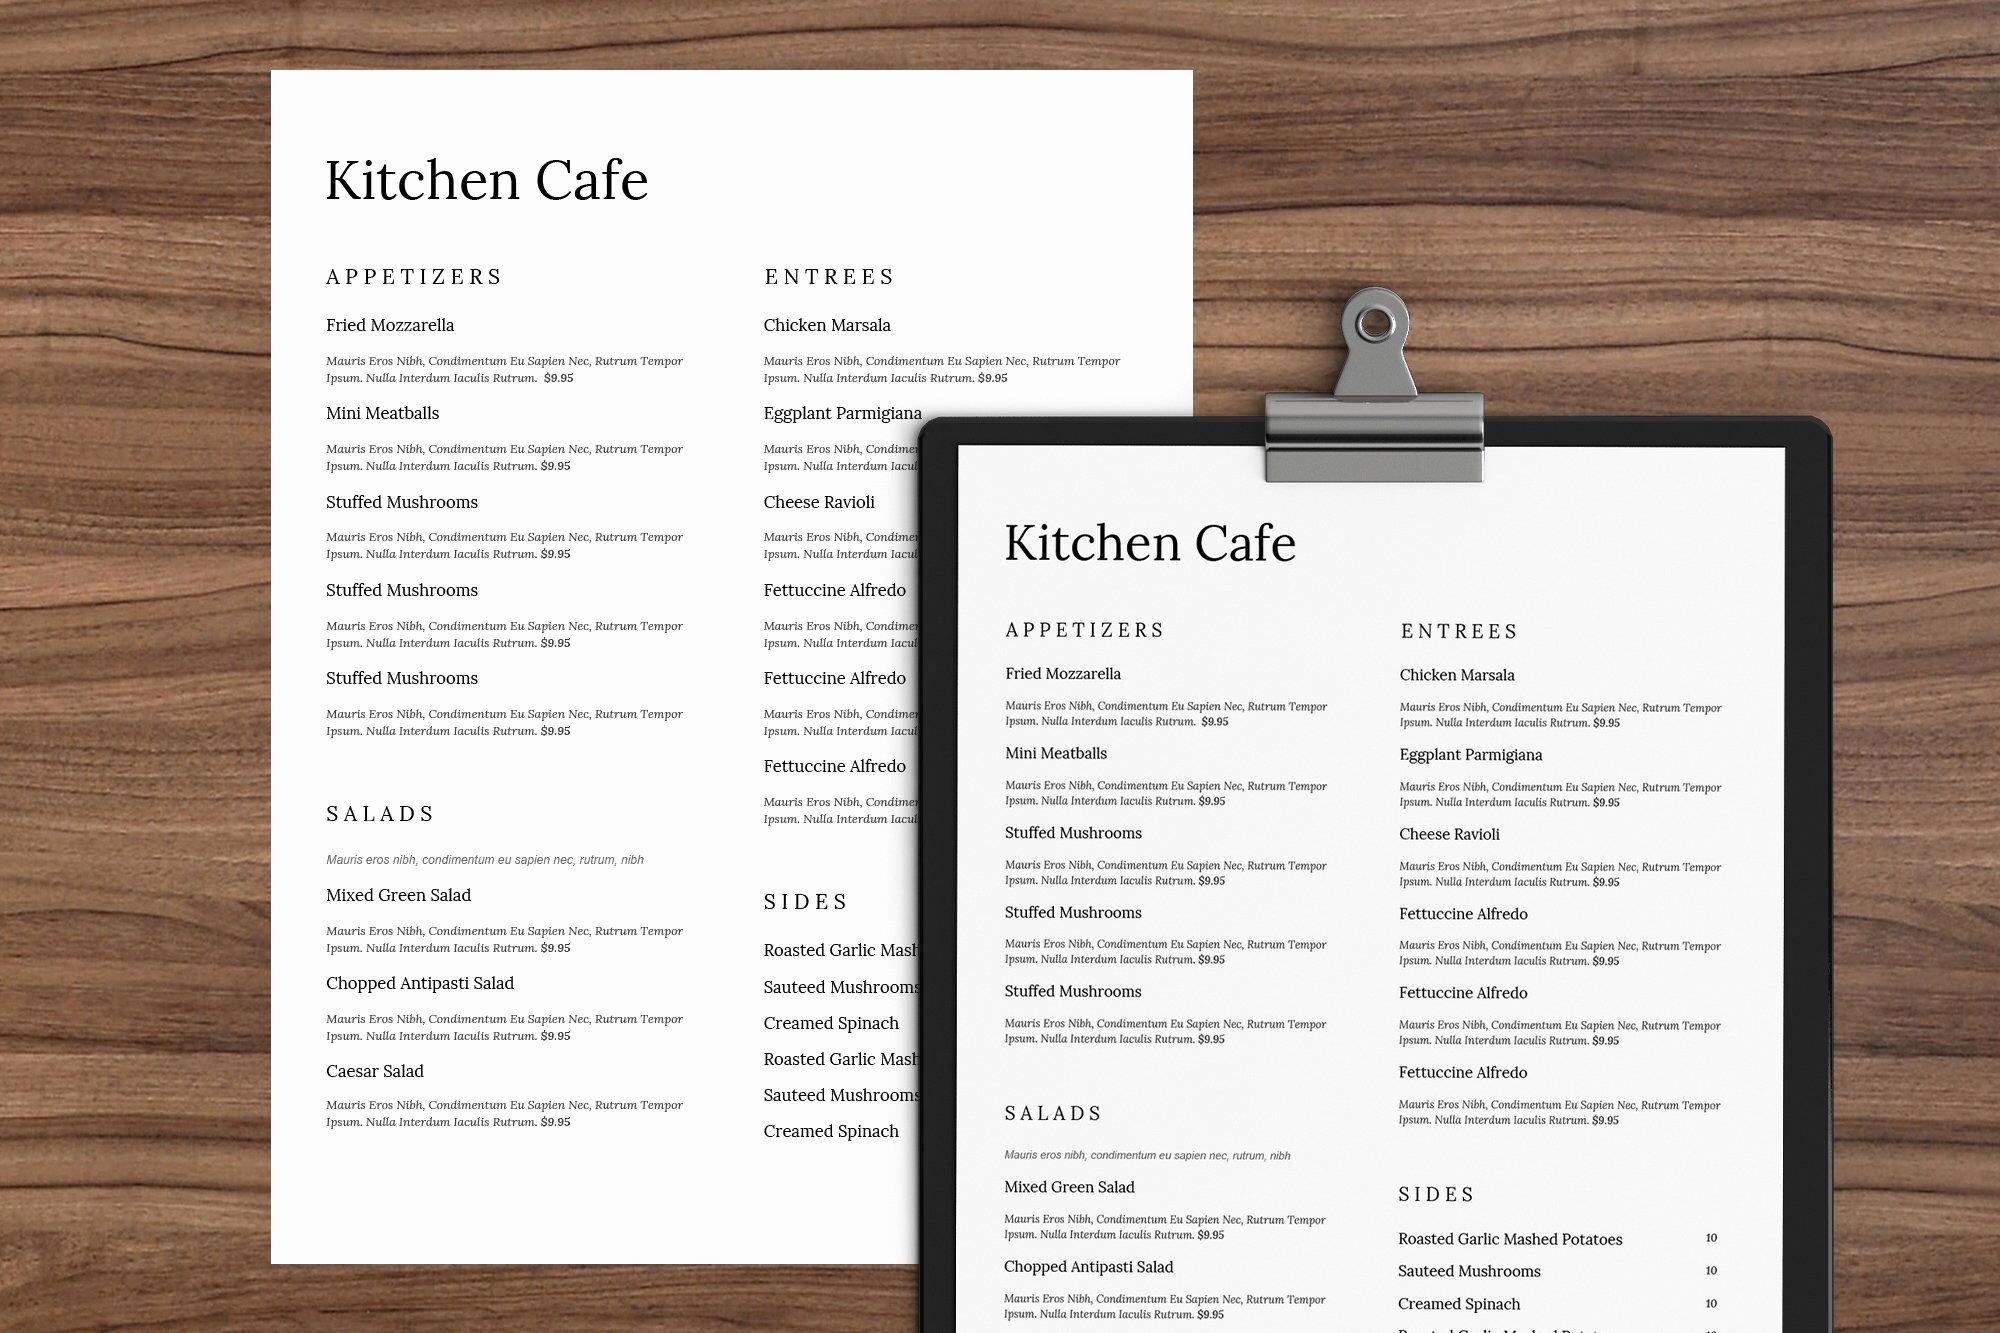 Menu Template Google Docs Lovely Menu Template Google Docs Restaurant Free Dinner Food List